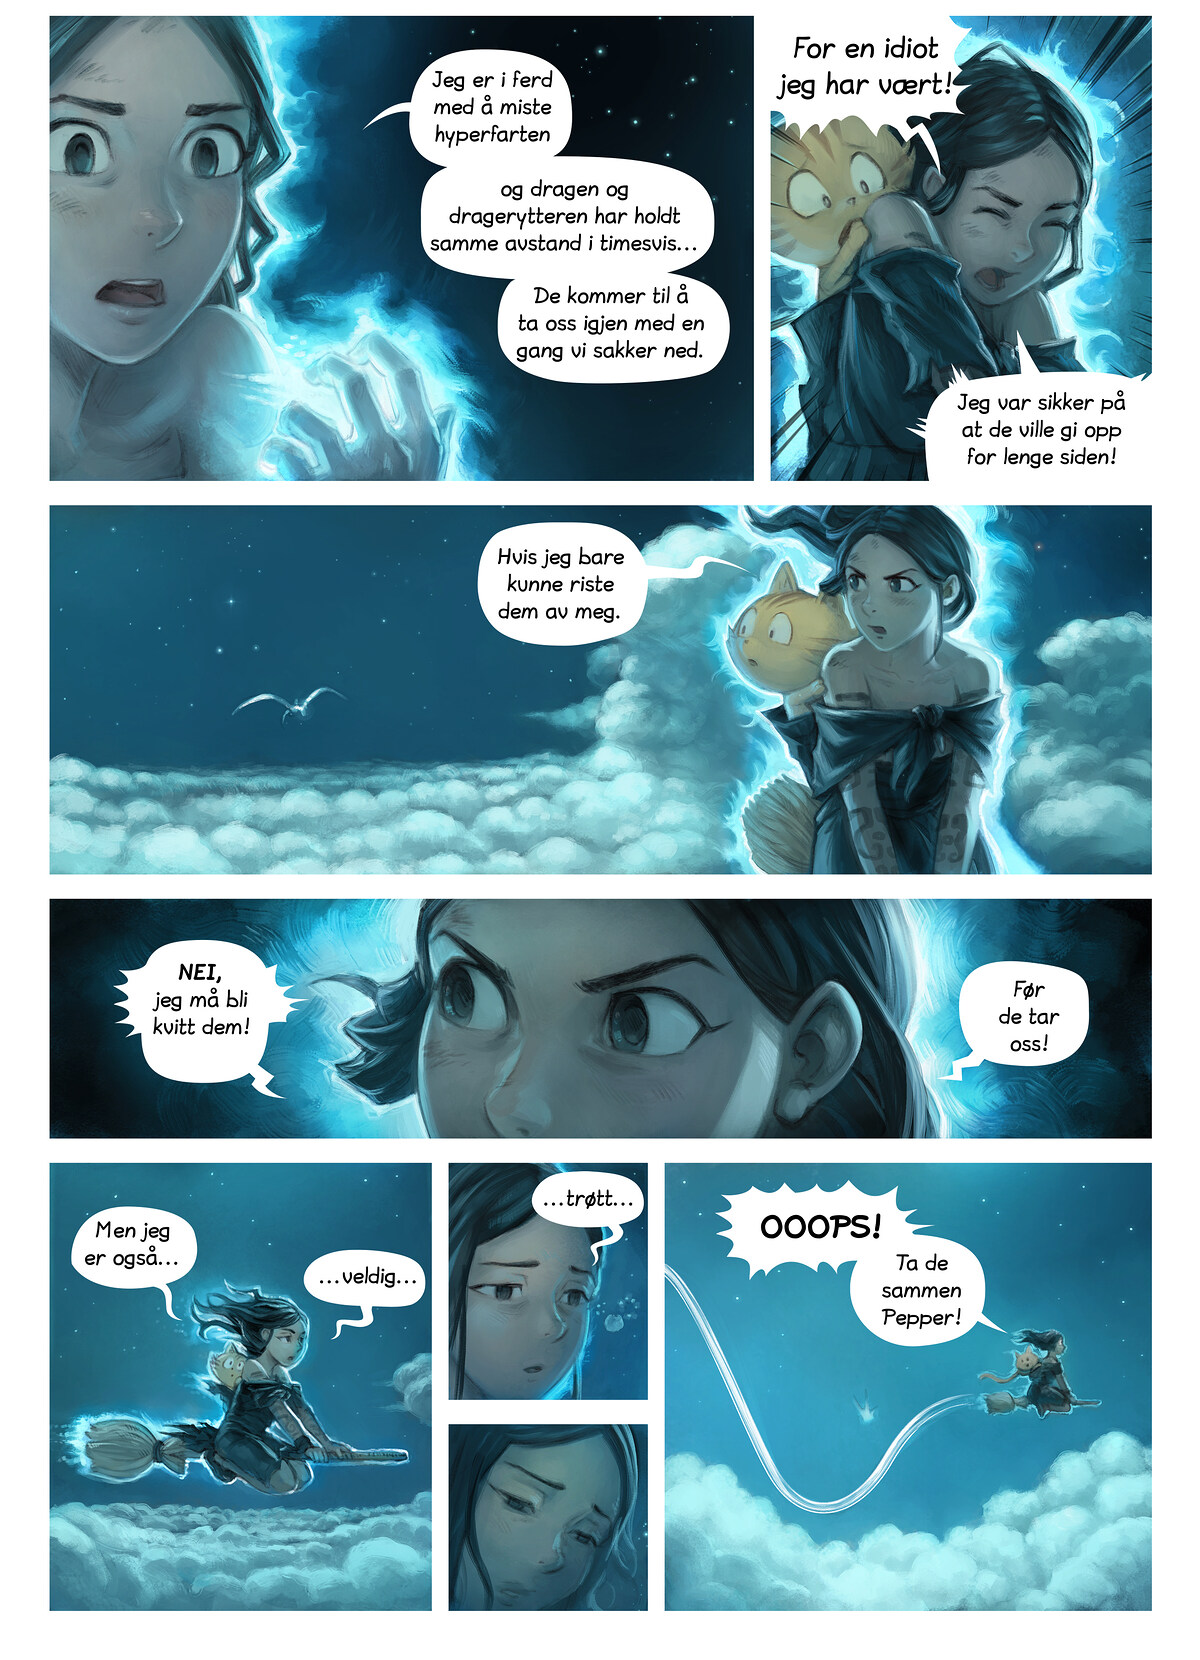 Episode 35: Tid for ettertanke, Page 2